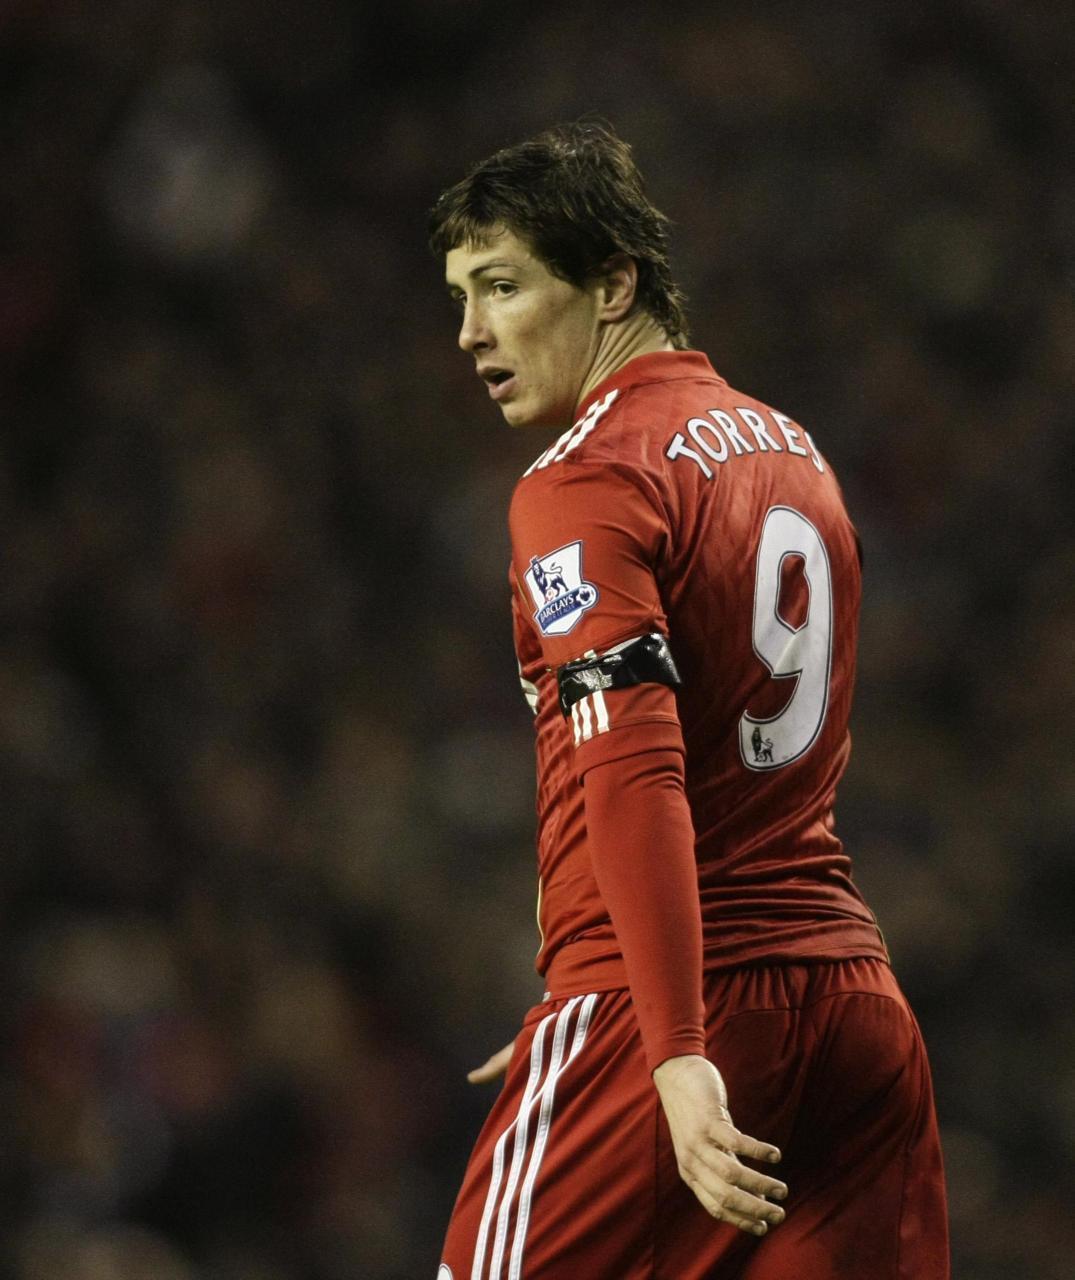 Nando - Liverpool(2) vs Bolton Wanderers(1)